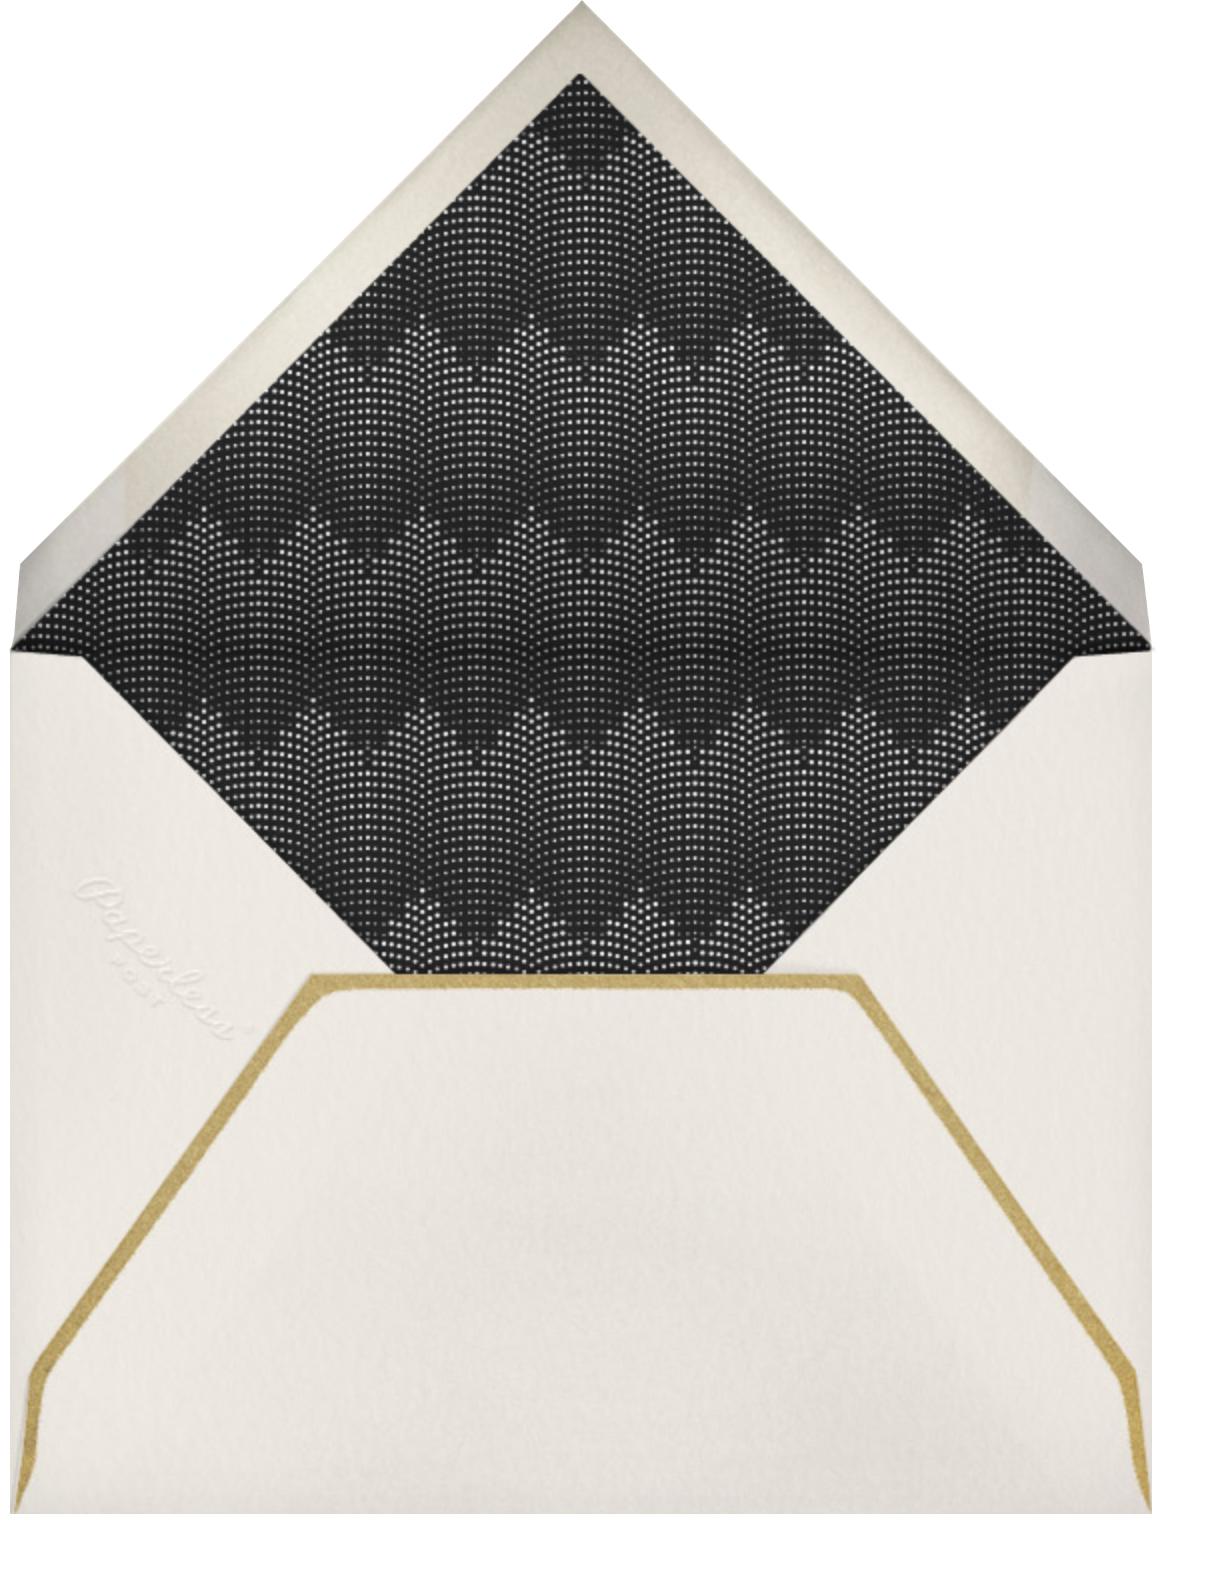 Rosina Photo - Gold - Paperless Post - Photo  - envelope back